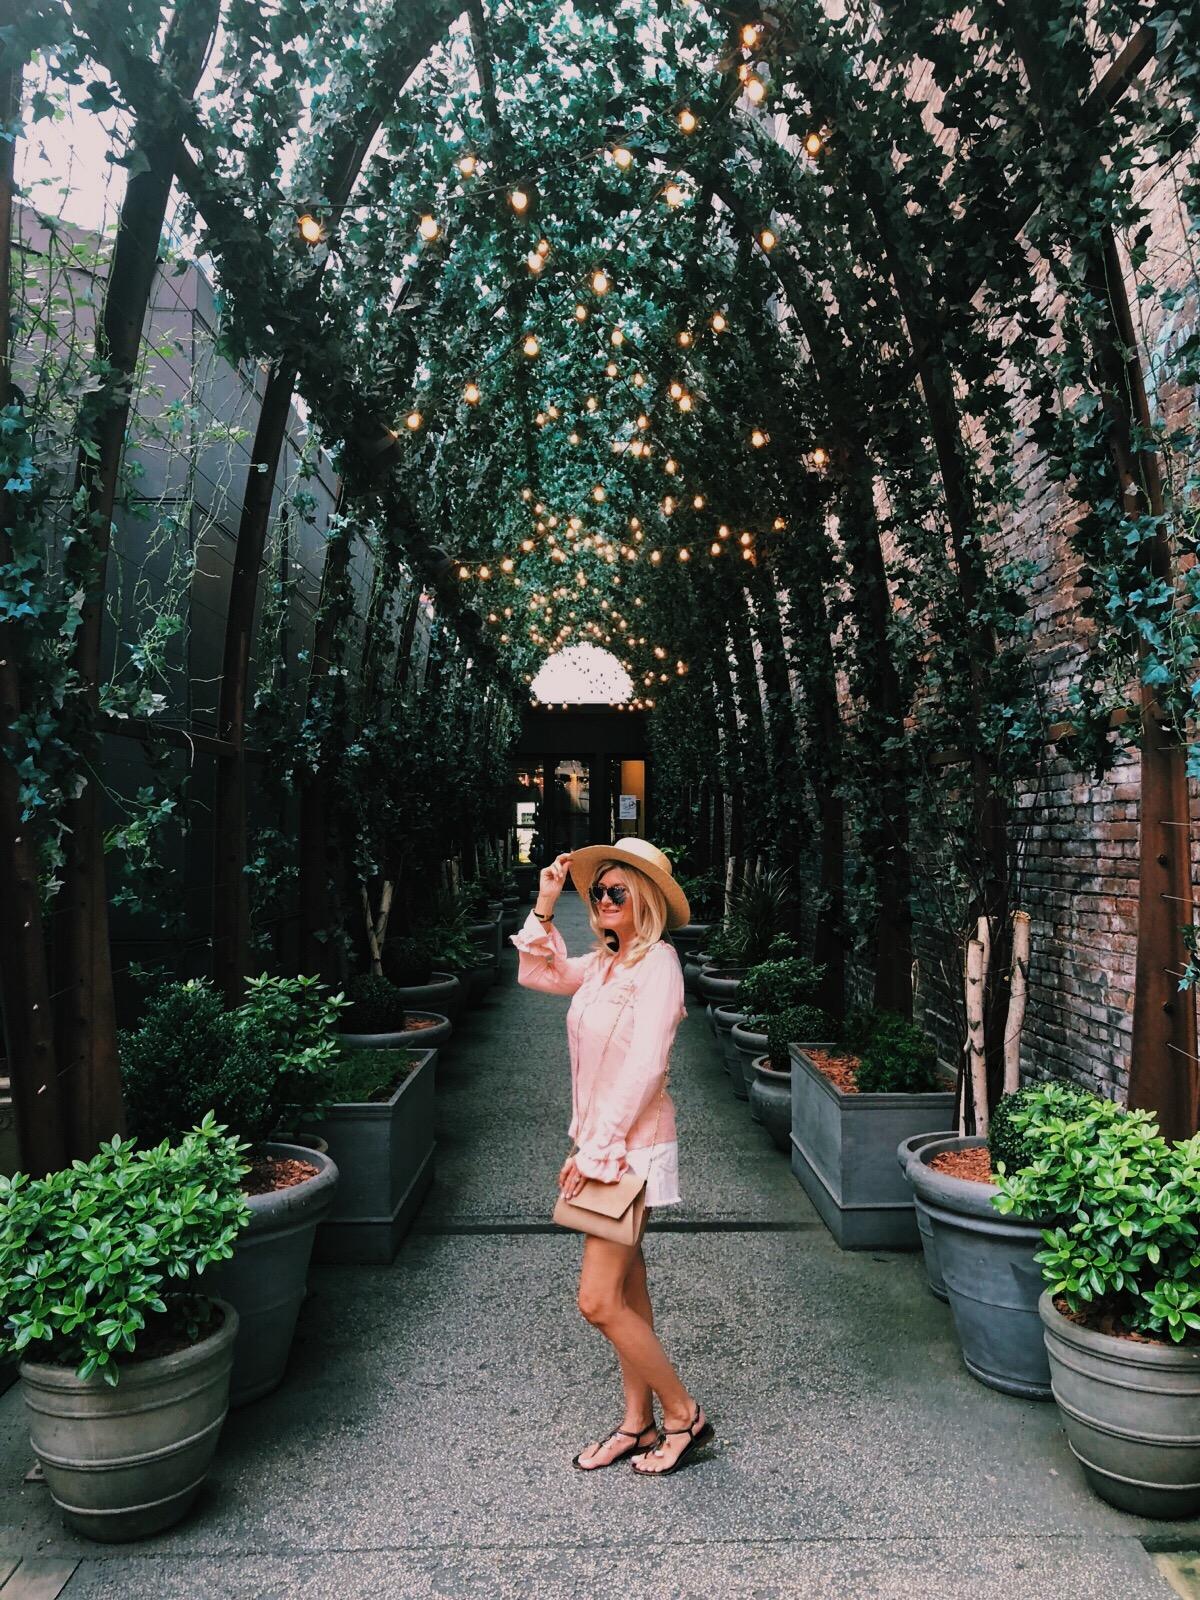 Instagram Guide for Navigating New York City